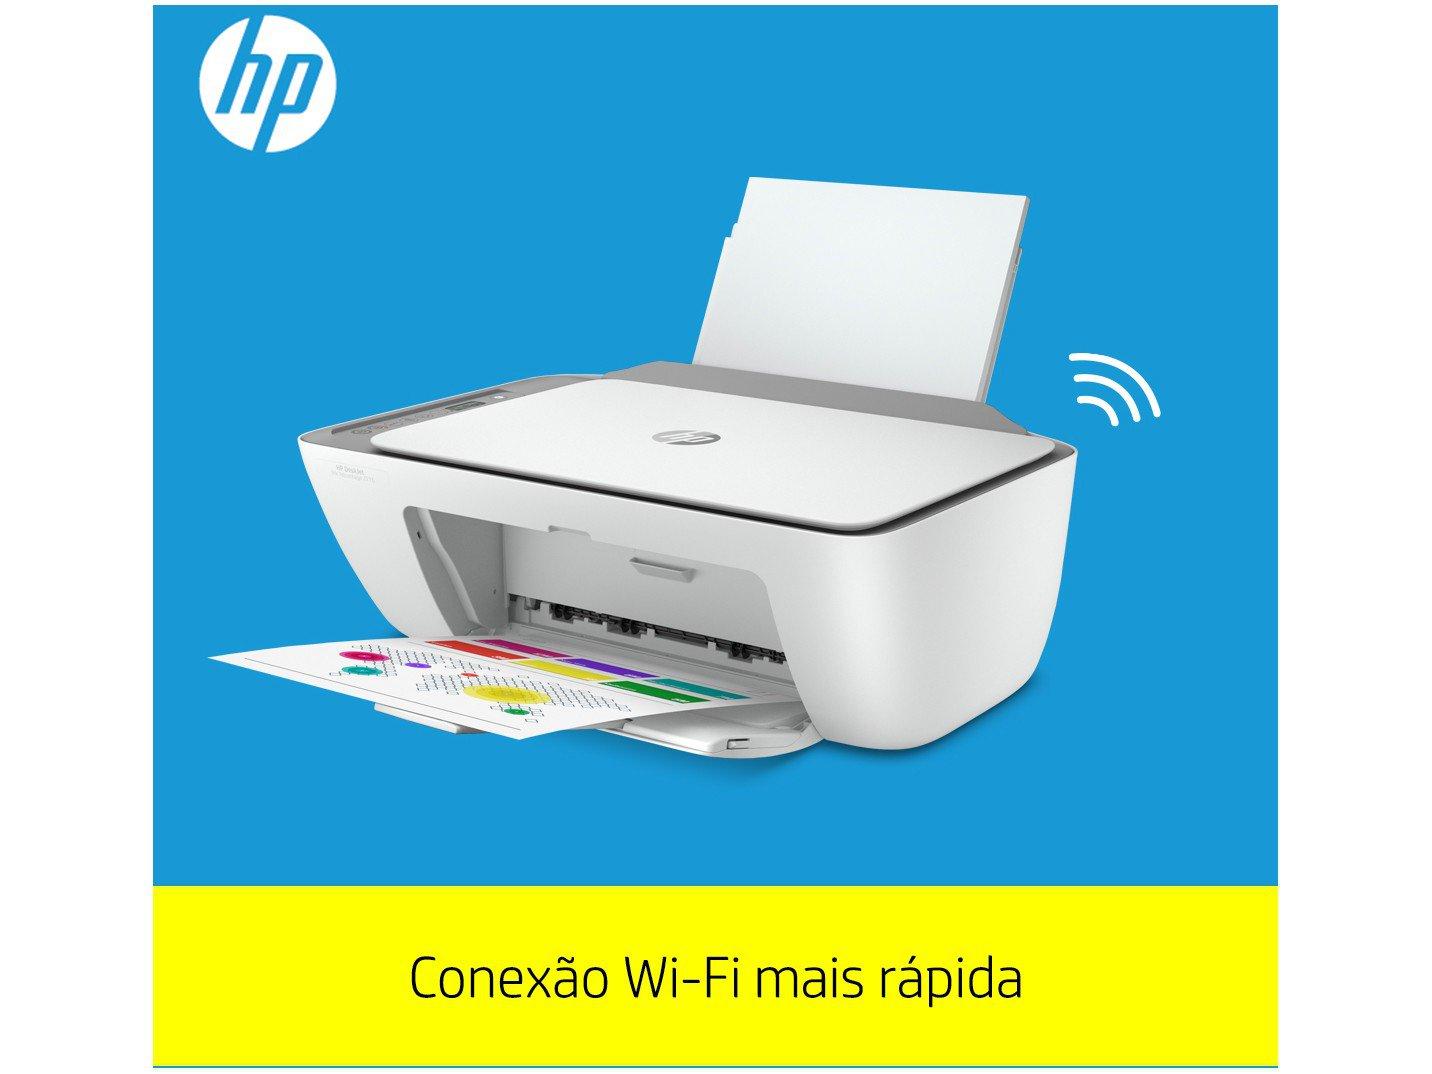 Impressora Multifuncional HP DeskJet Ink Advantage - 2776 Jato de Tinta Colorida Wi-Fi USB - Bivolt - 4